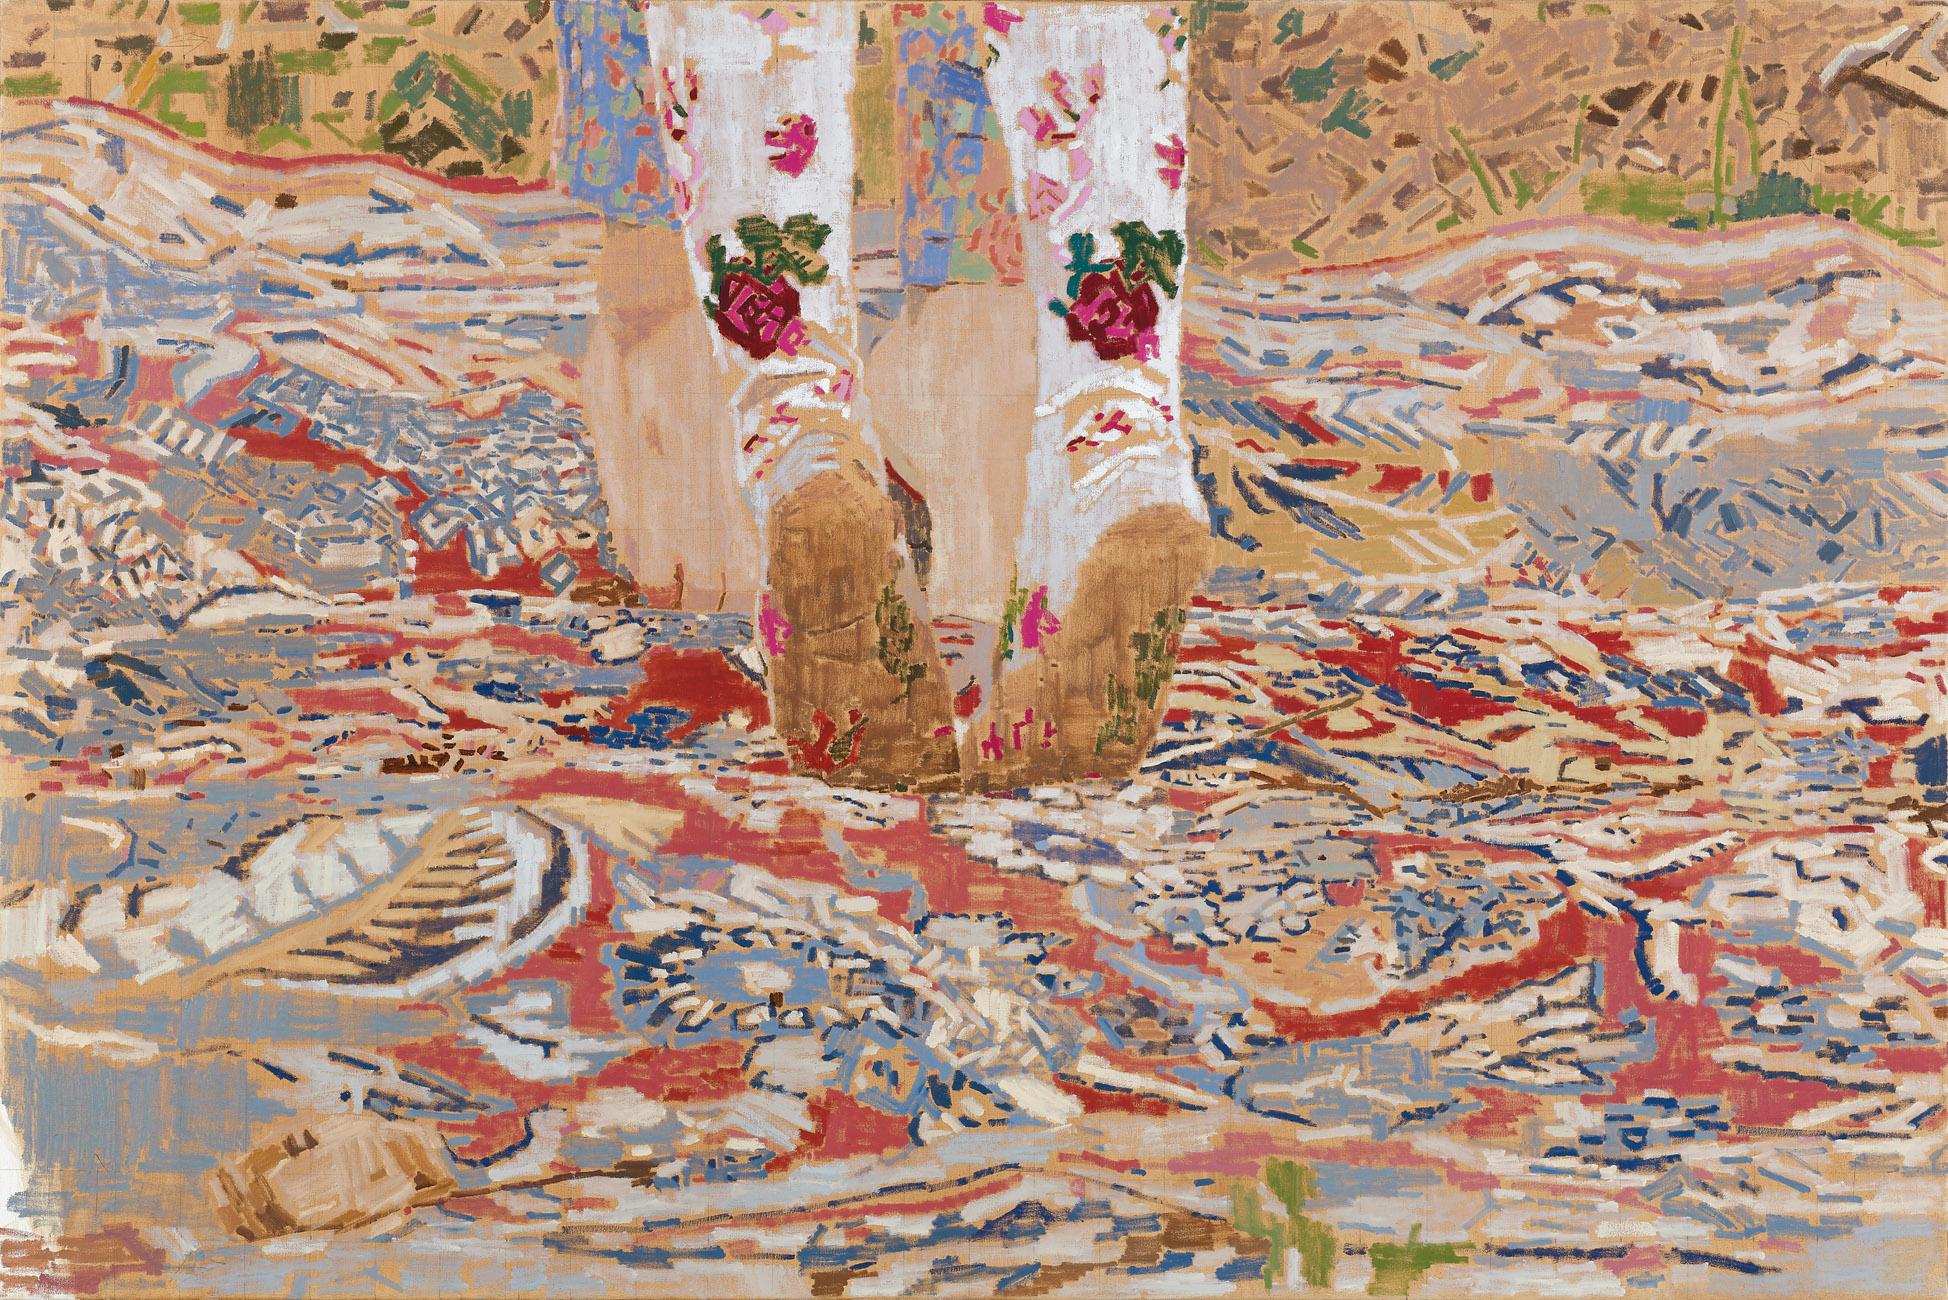 Lara, 2017, oil on canvas, 100x150, Ann and Dr. Ari Rosenblatt Collection, USA